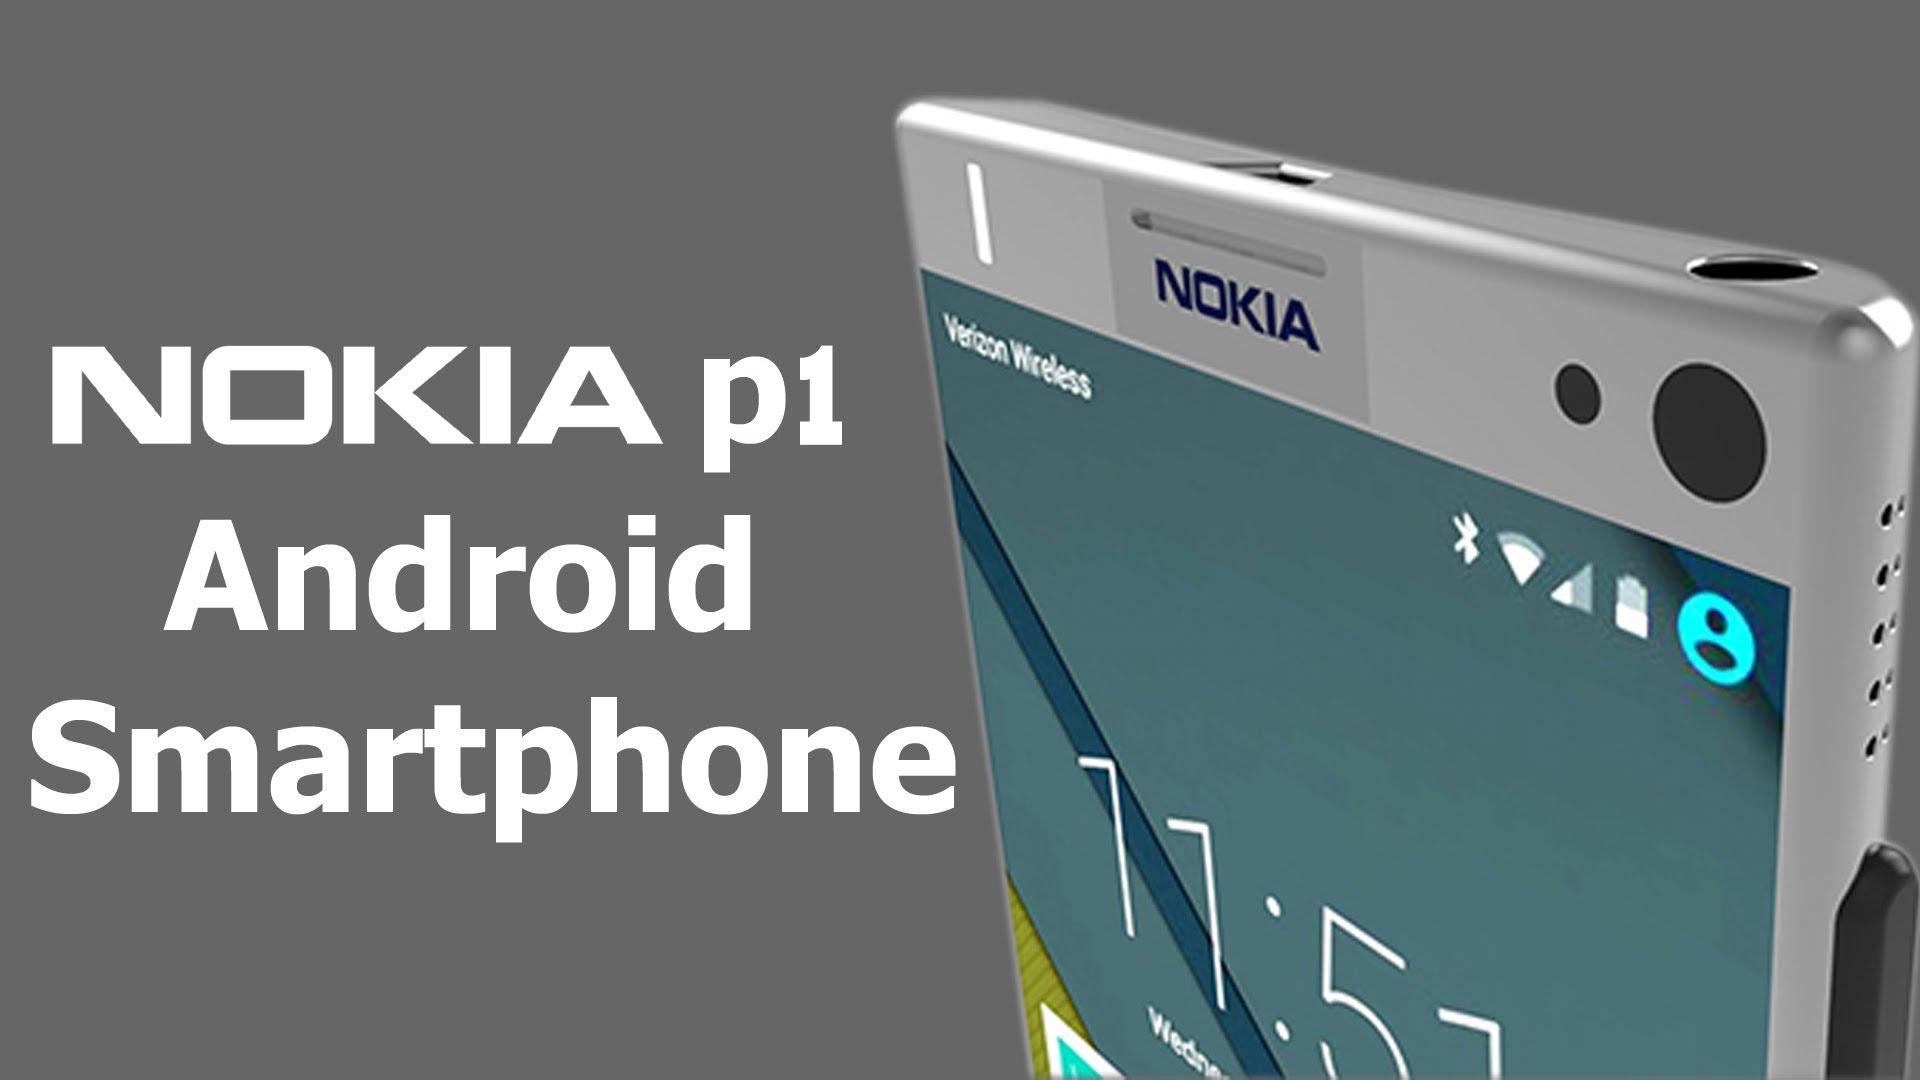 Nokia pronto anunciará su modelo de gama alta